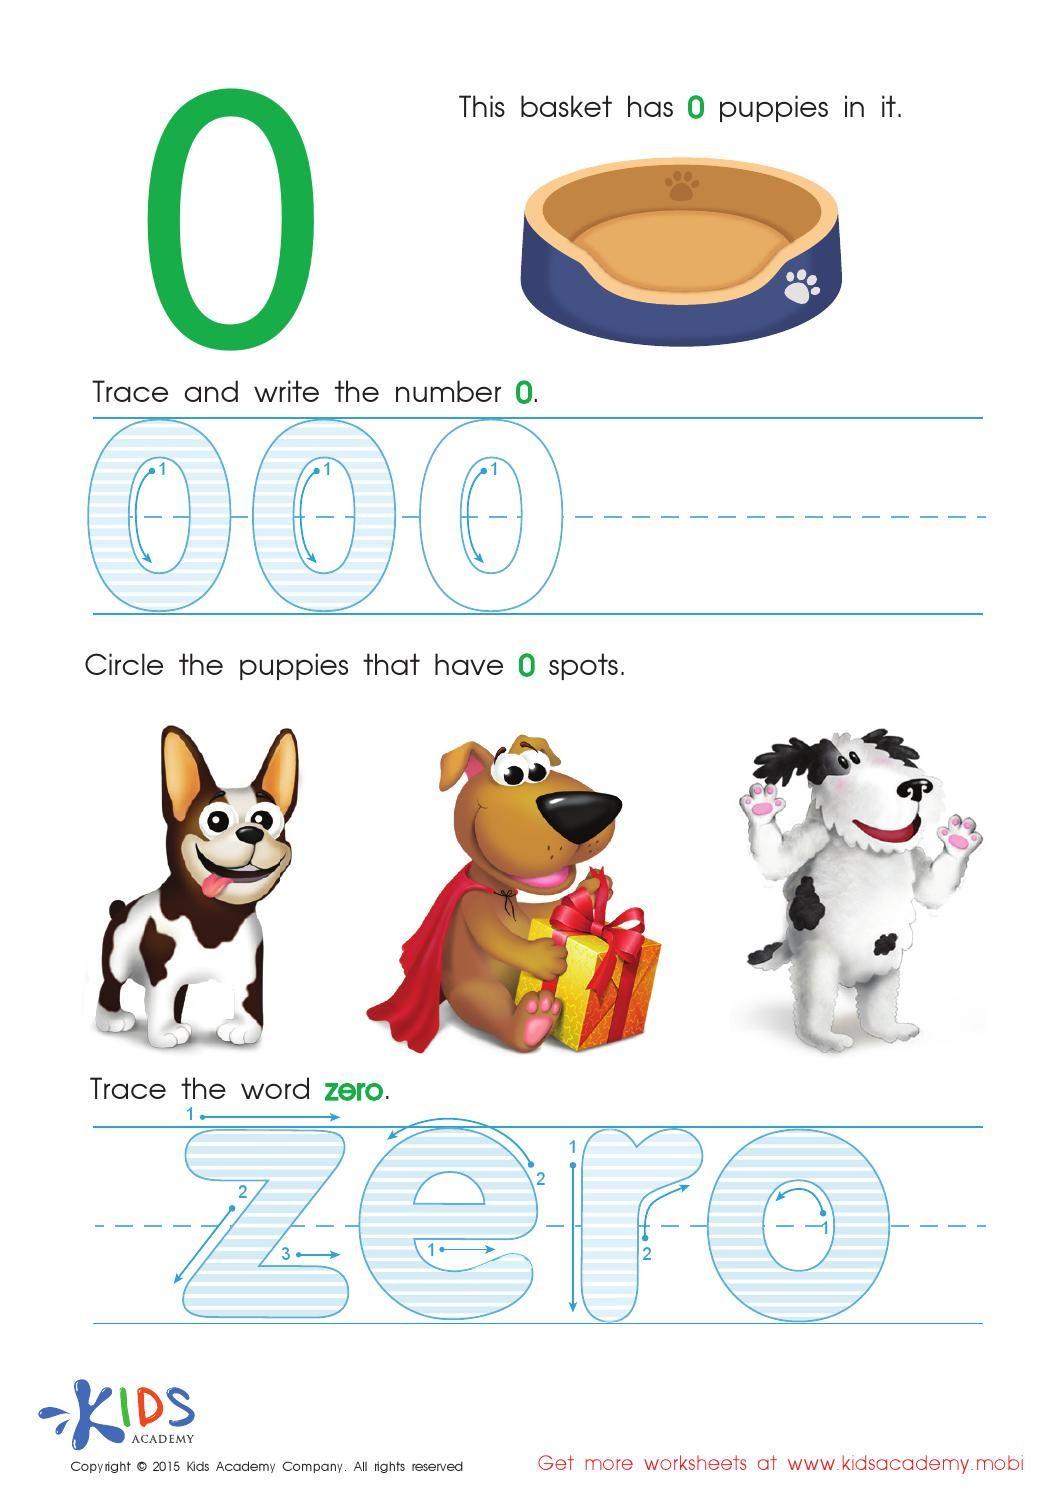 Free Preschool Printable Worksheets Math Numbers Kindergarten Worksheets Printable Preschool Worksheets Free Preschool [ 1497 x 1058 Pixel ]